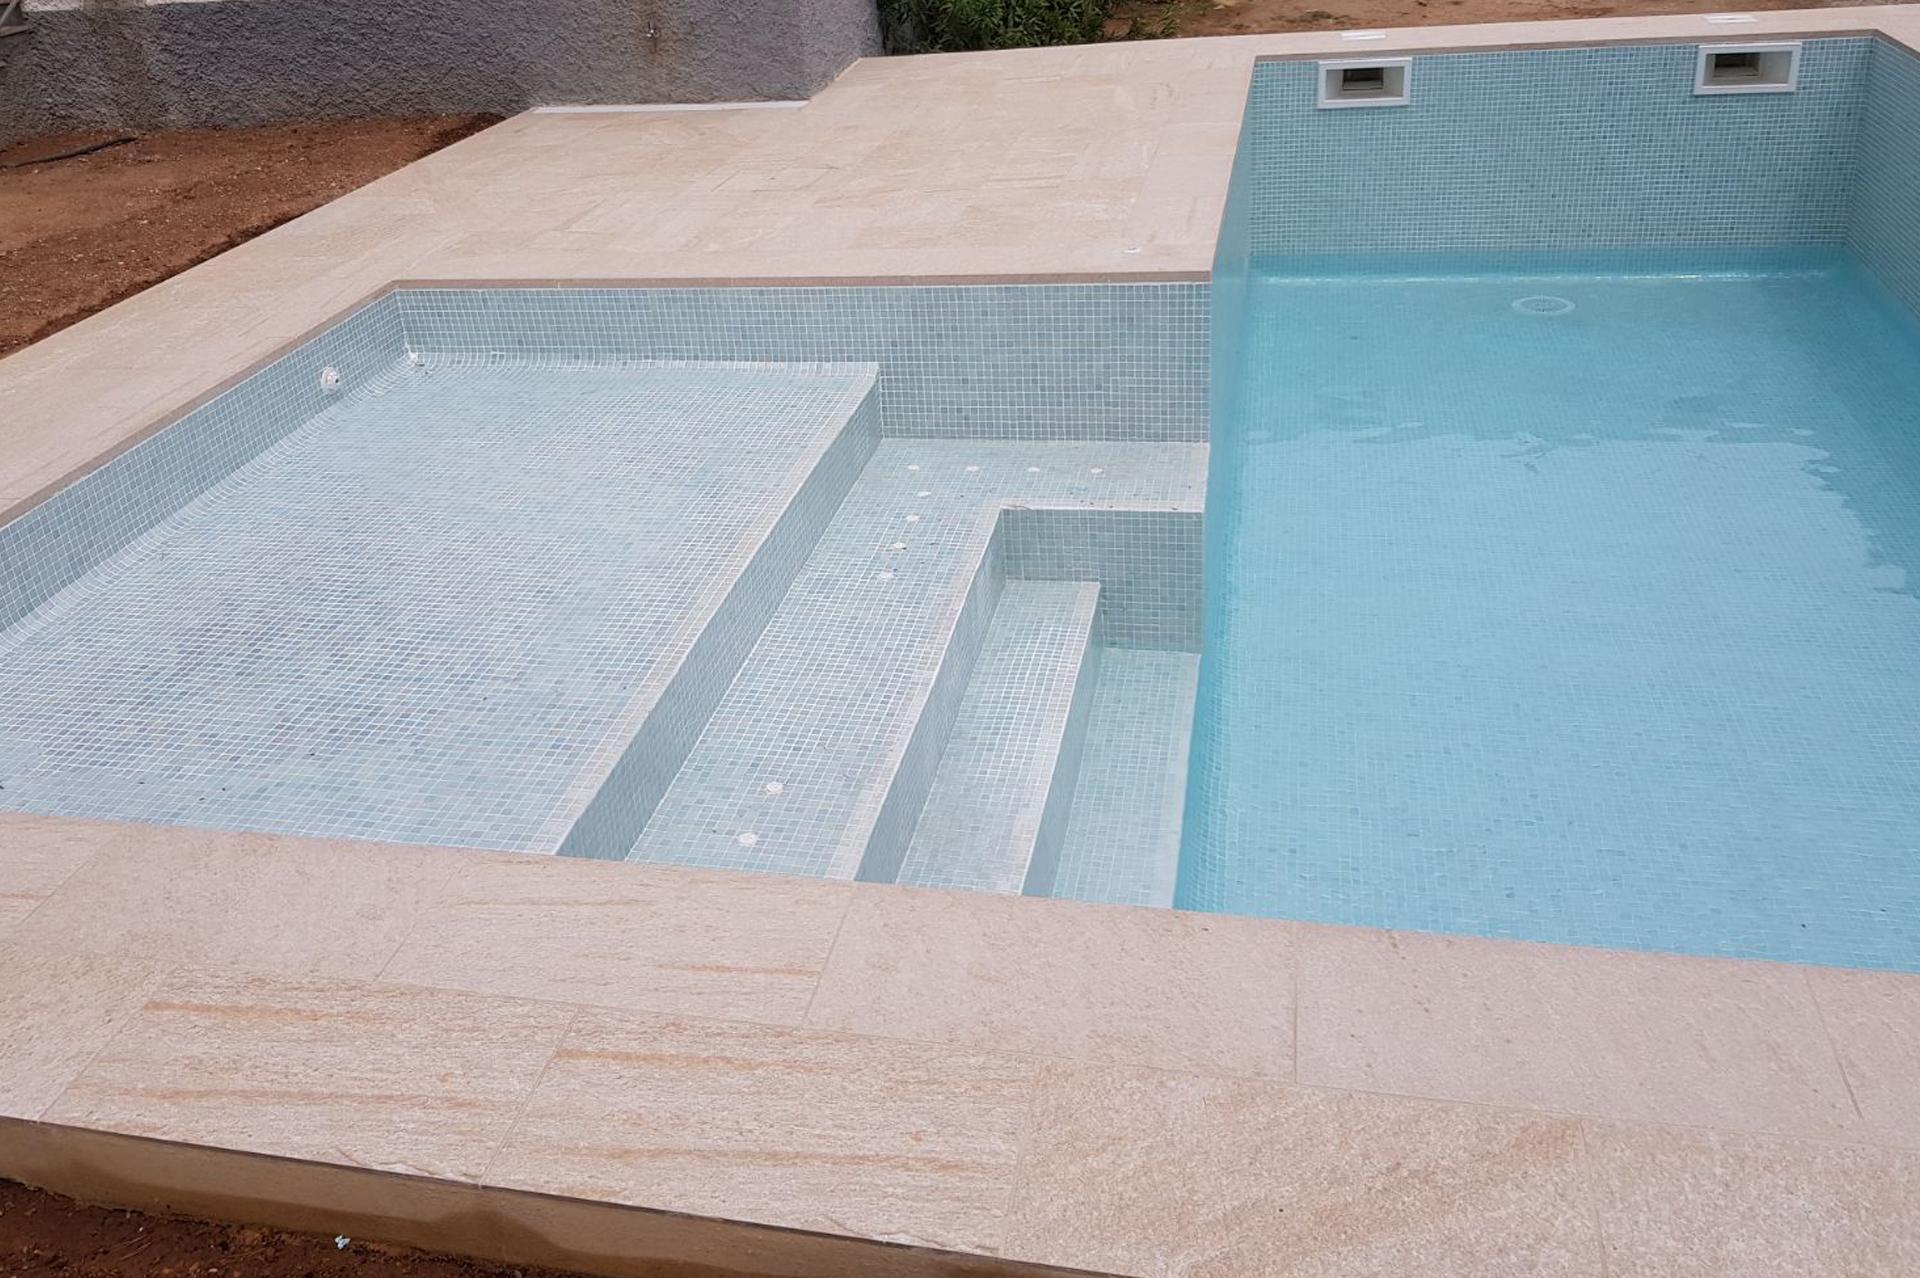 reforma_piscina_1_3